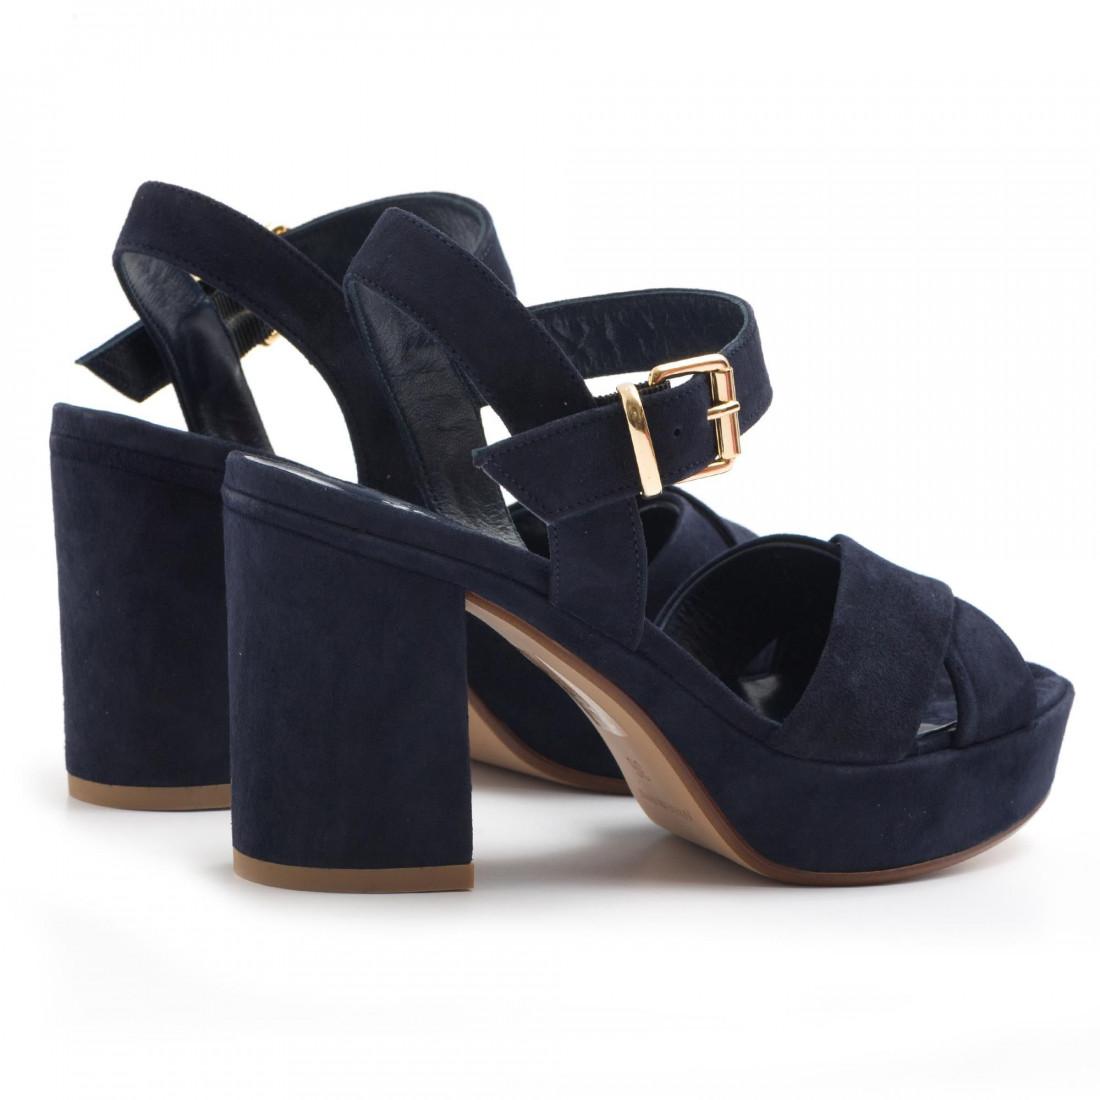 sandals woman silvia rossini 1513 5053camoscio blu navy 3183